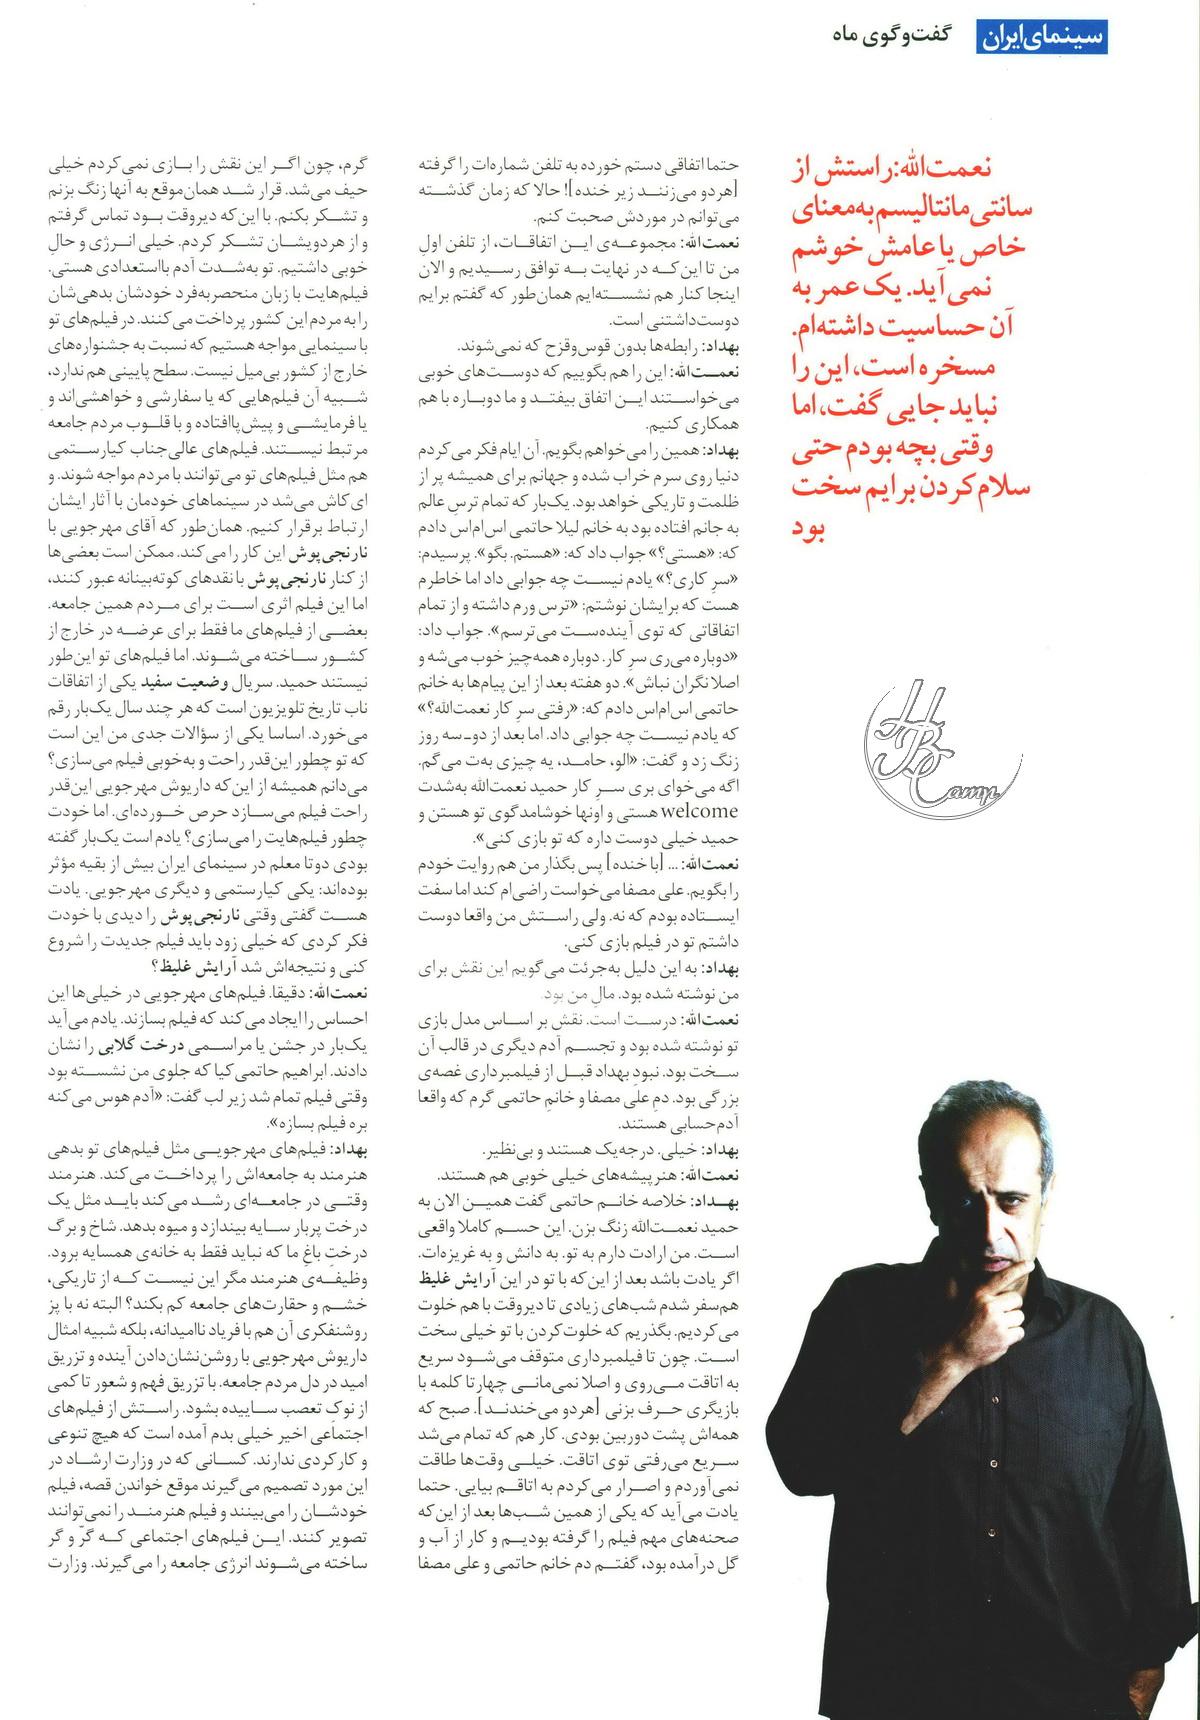 http://yotab.persiangig.com/magazin/24mag-56/05.jpg